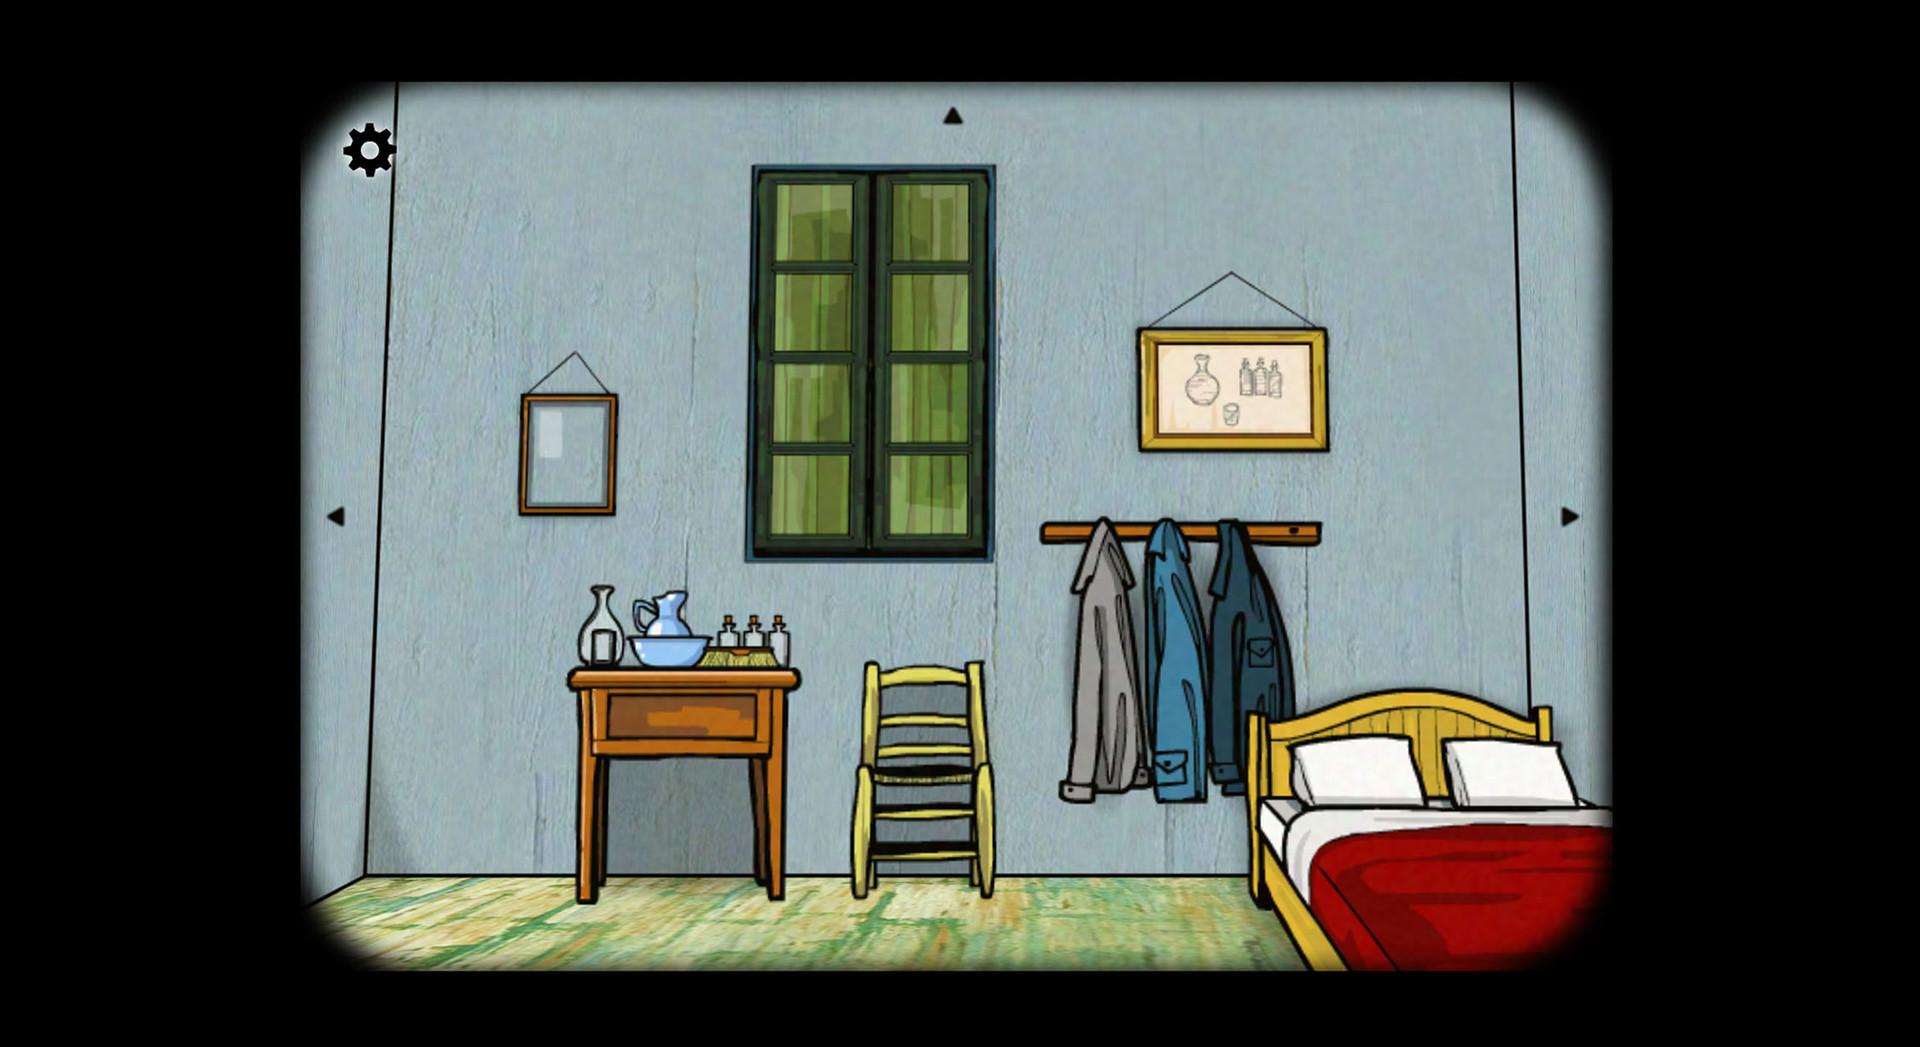 cube-escape-collection-pc-screenshot-01